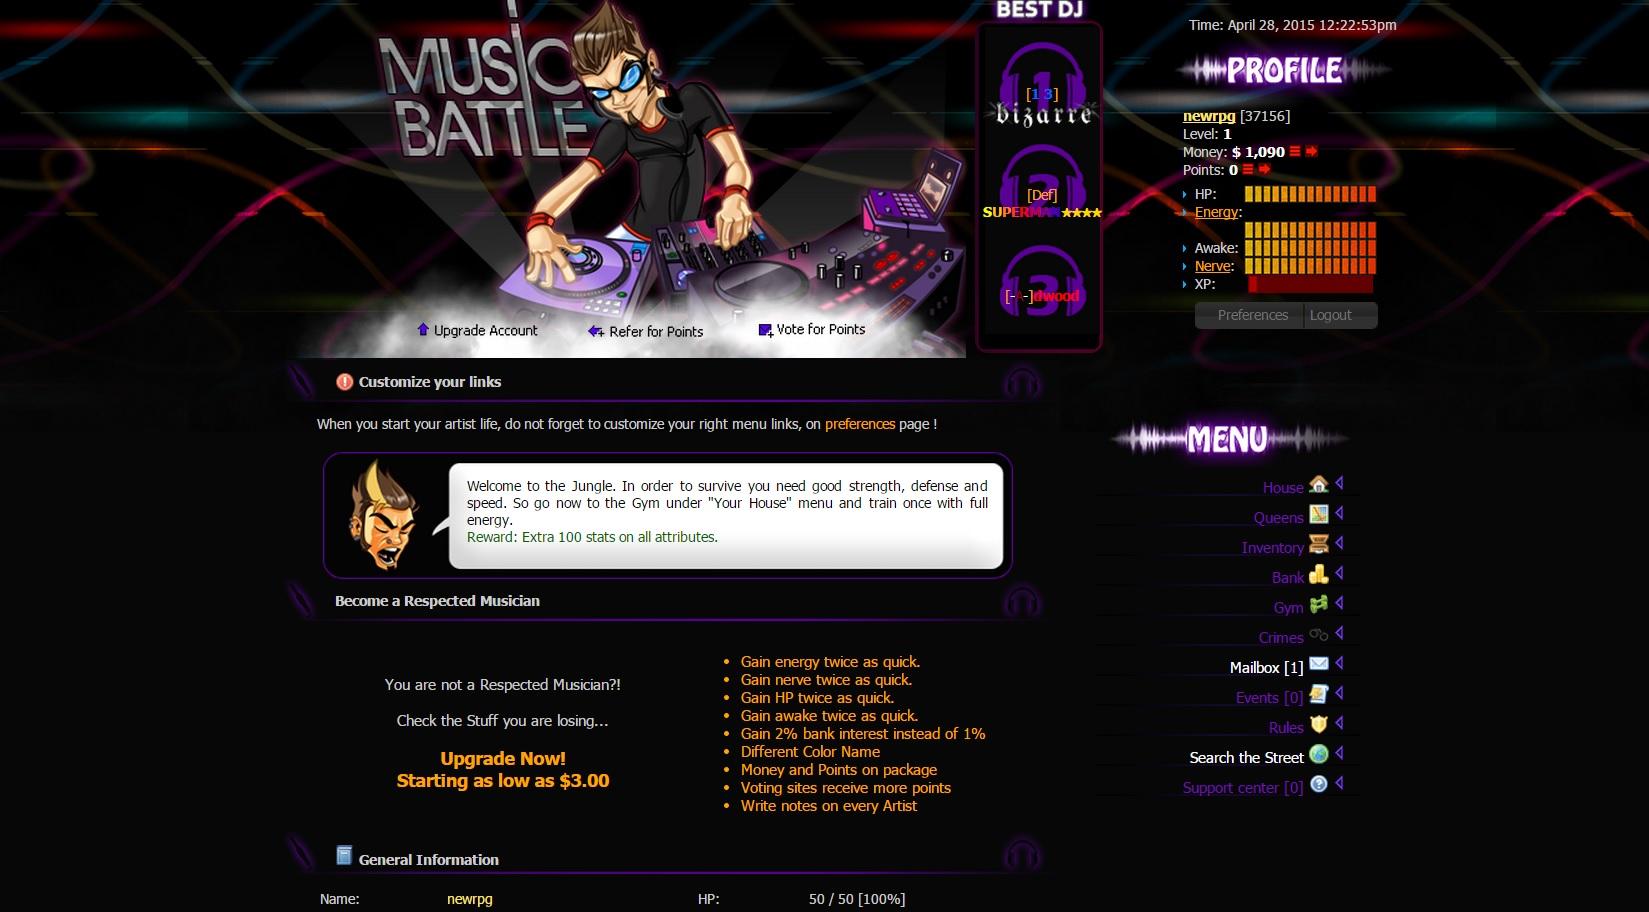 MusicBattle